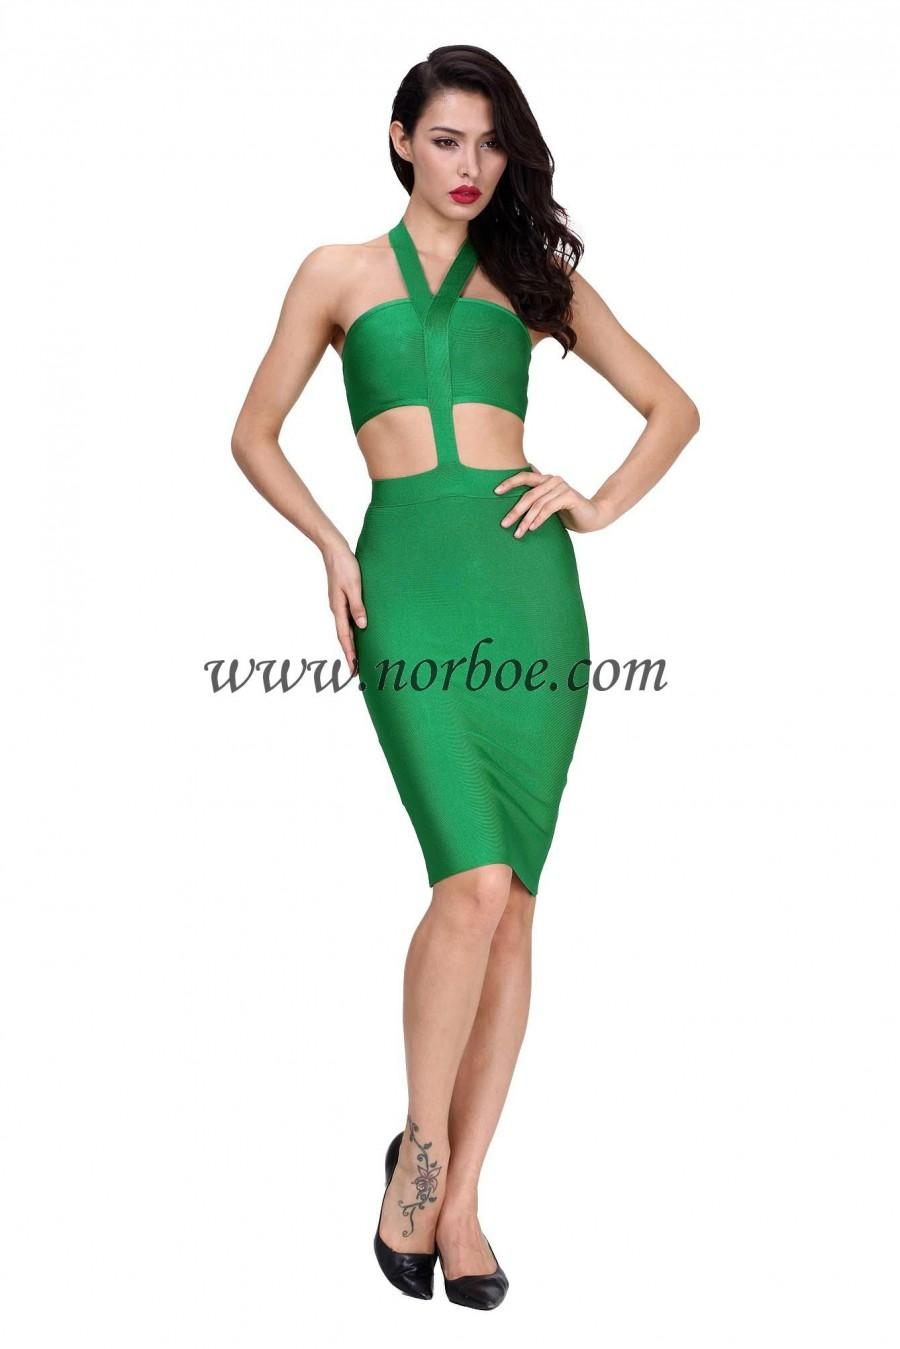 Wedding - Norboe New Halter Green Bandage Dress